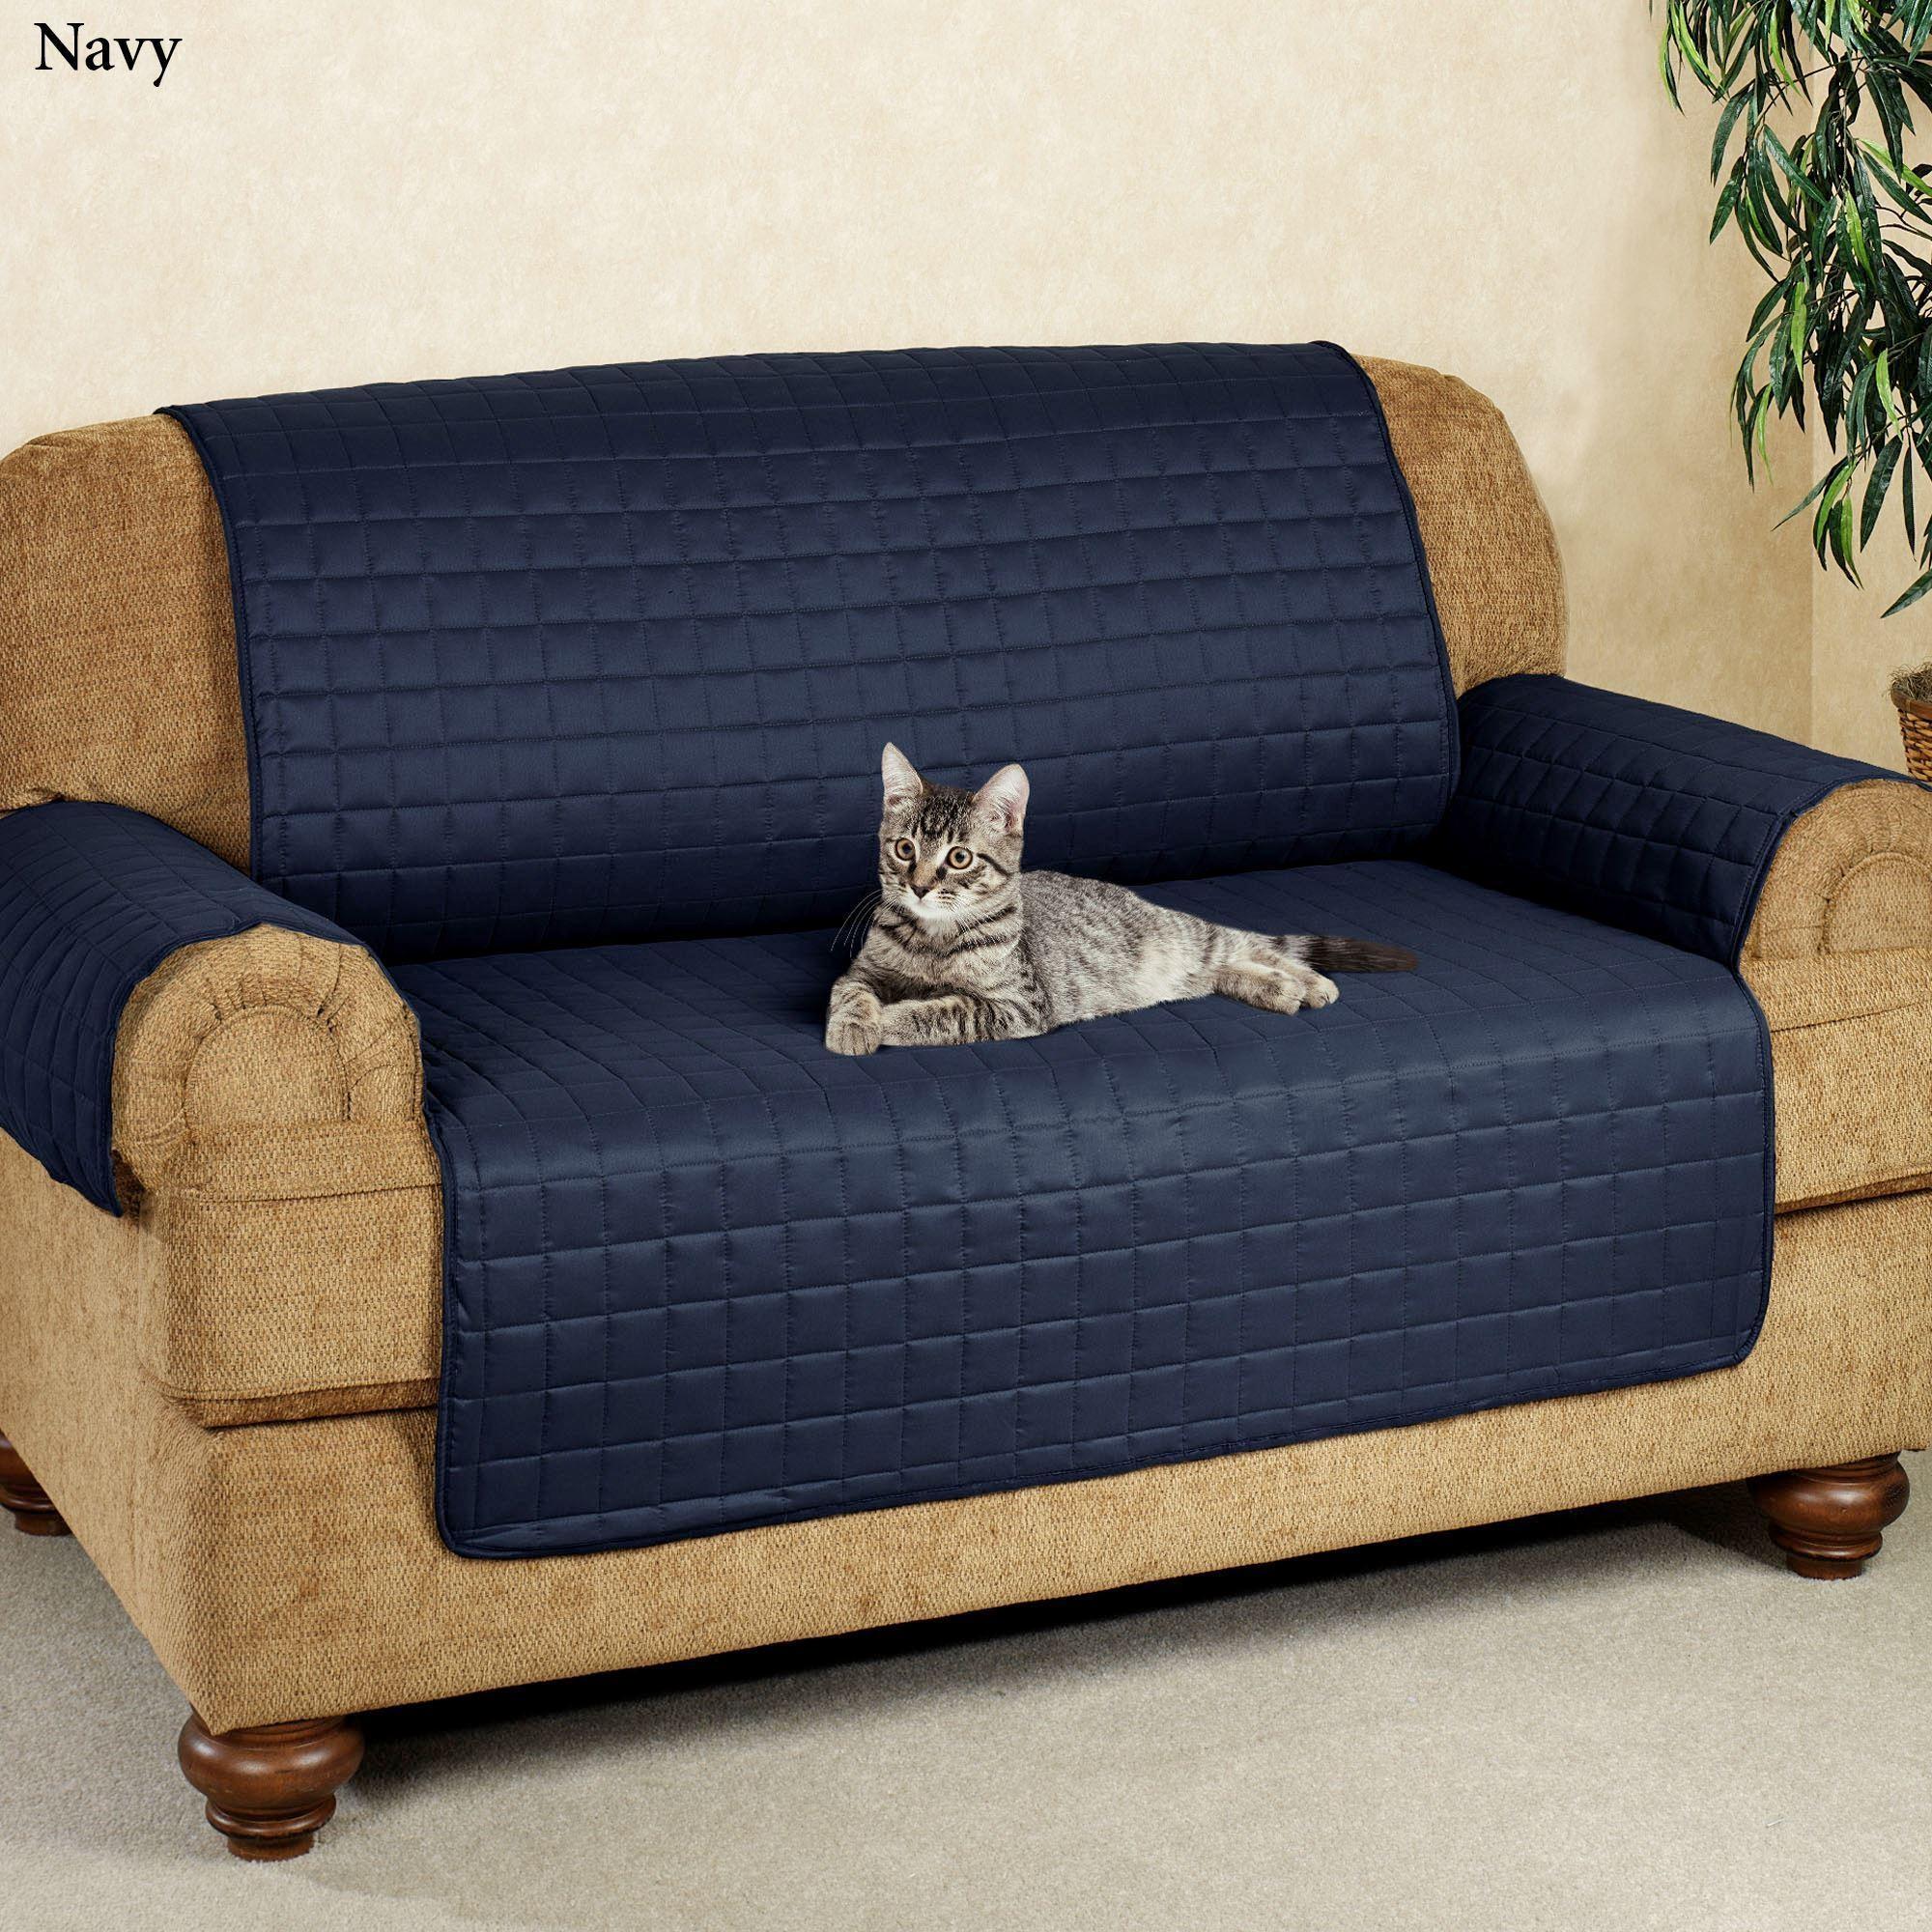 Navy Blue Sofa Slipcovers | Tehranmix Decoration In Blue Sofa Slipcovers (Image 10 of 20)